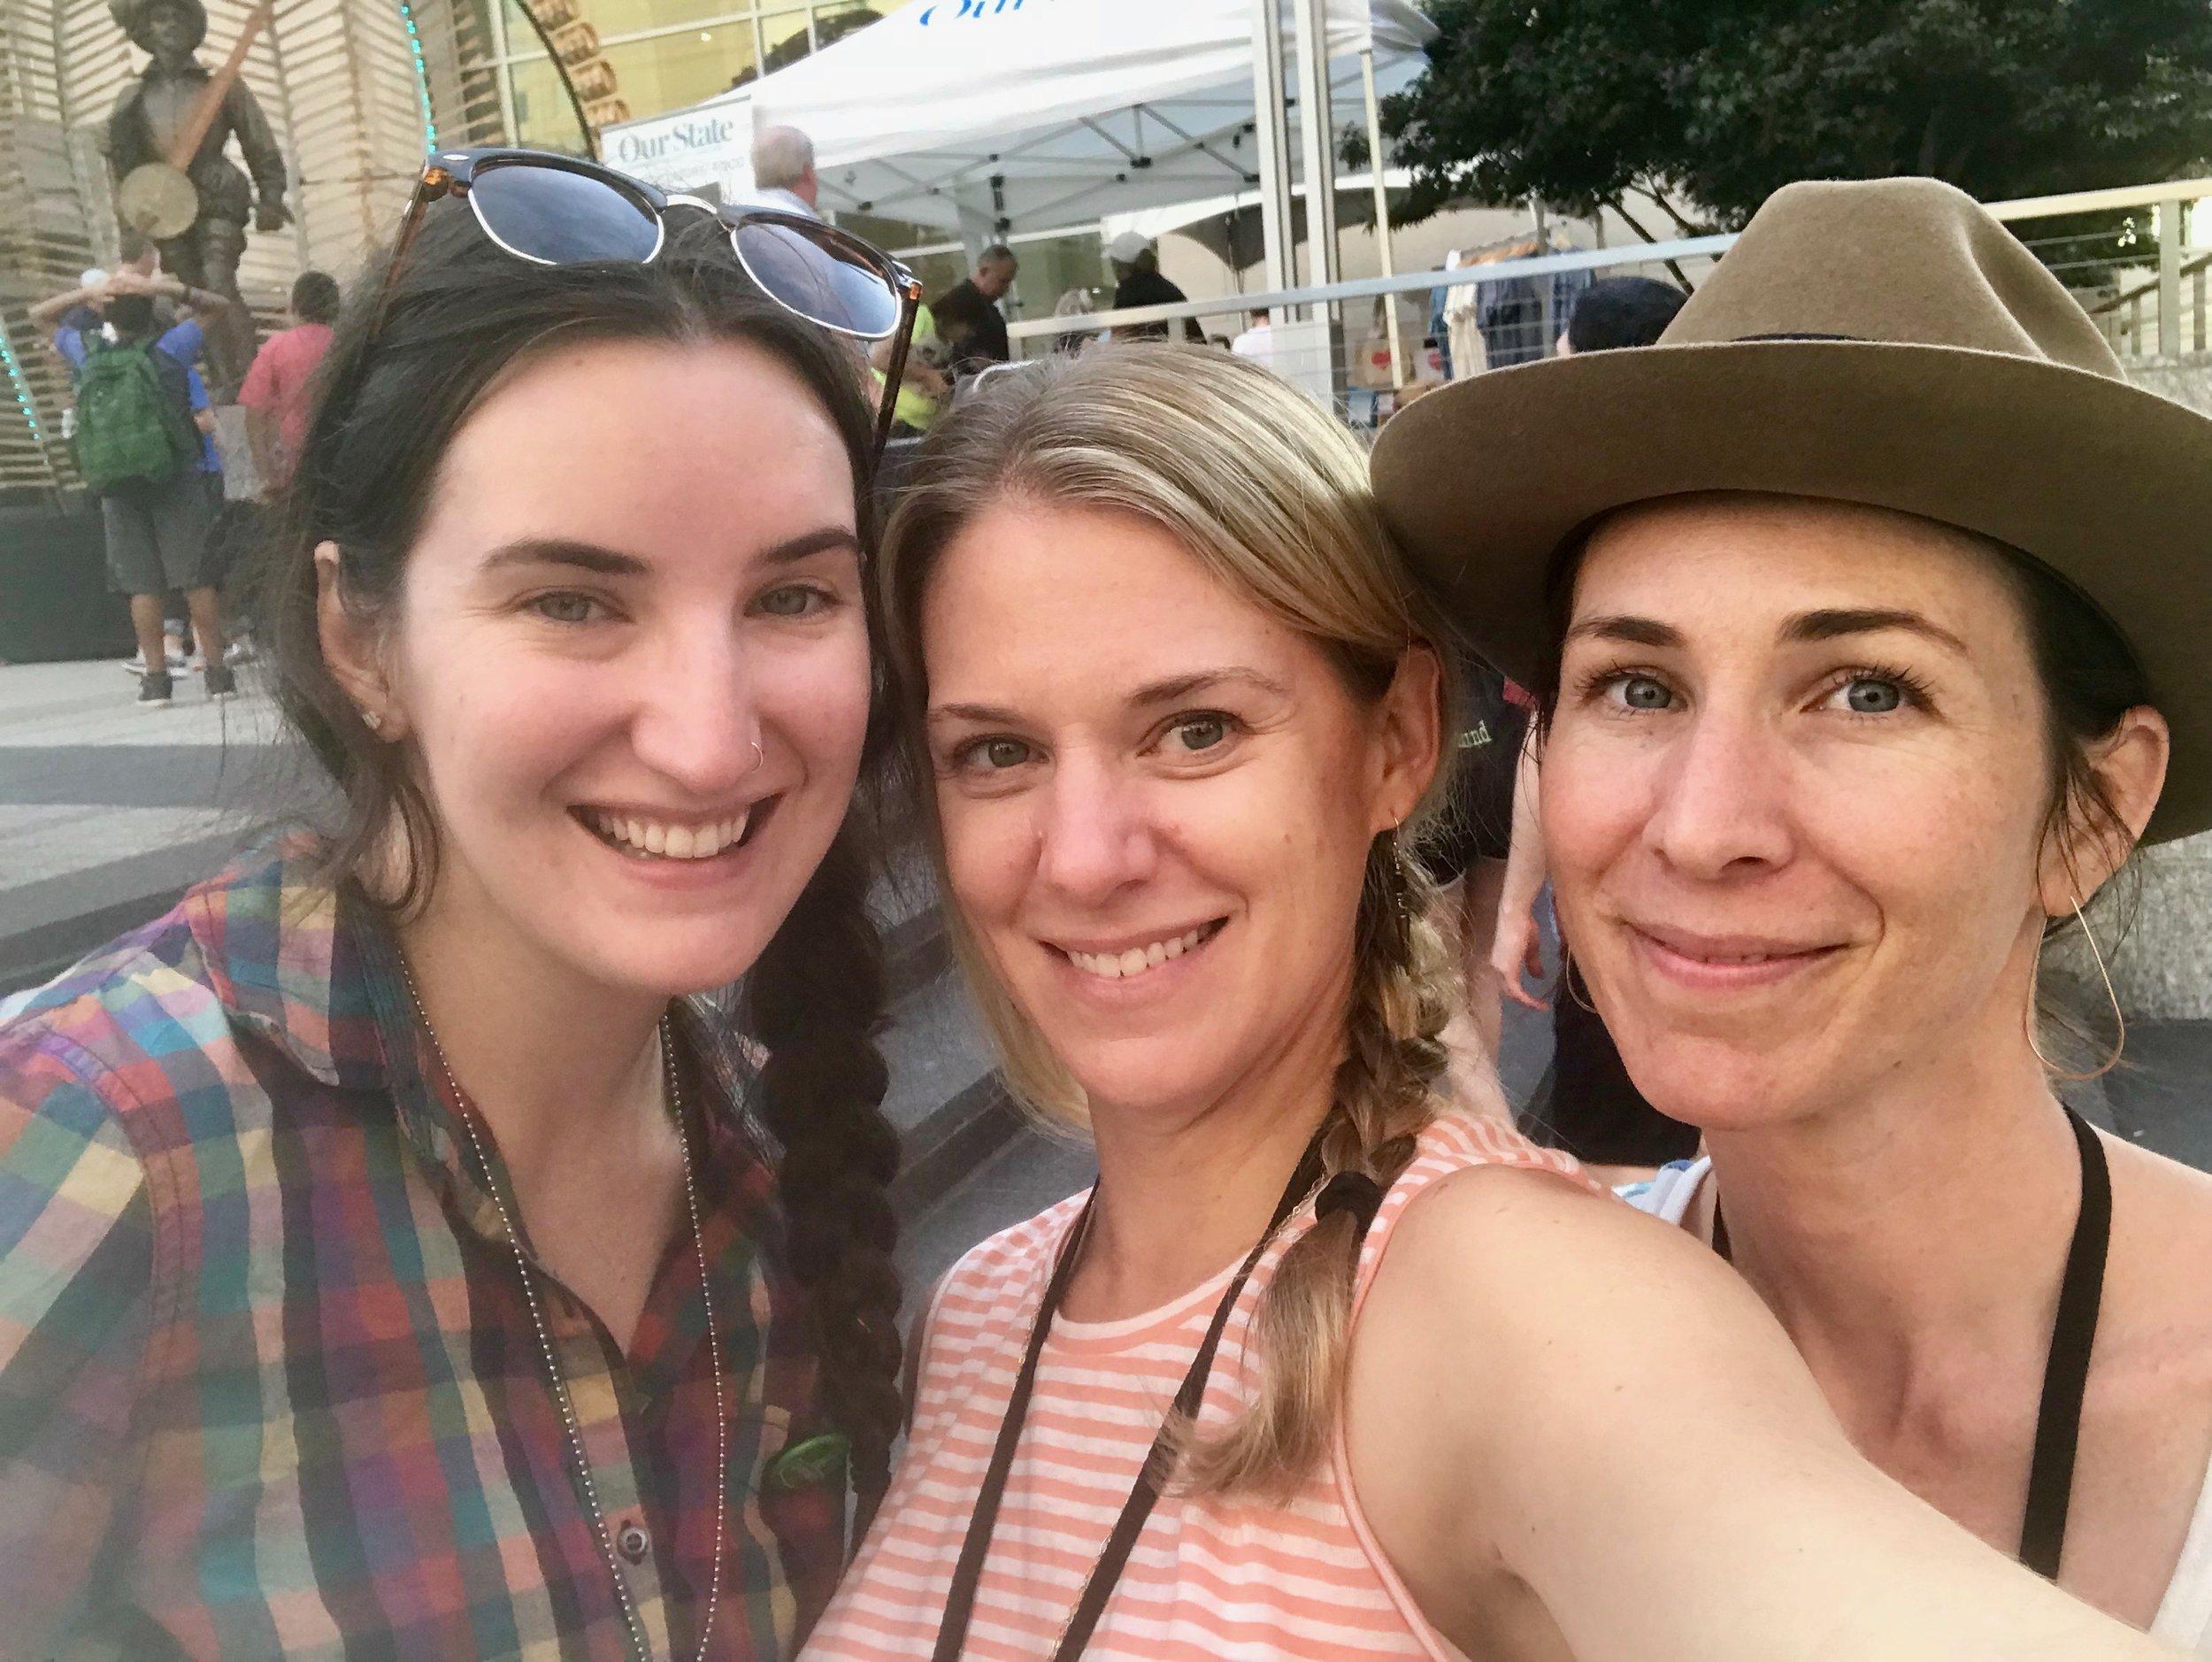 Kara, me and Gina, celebrating our successful week!